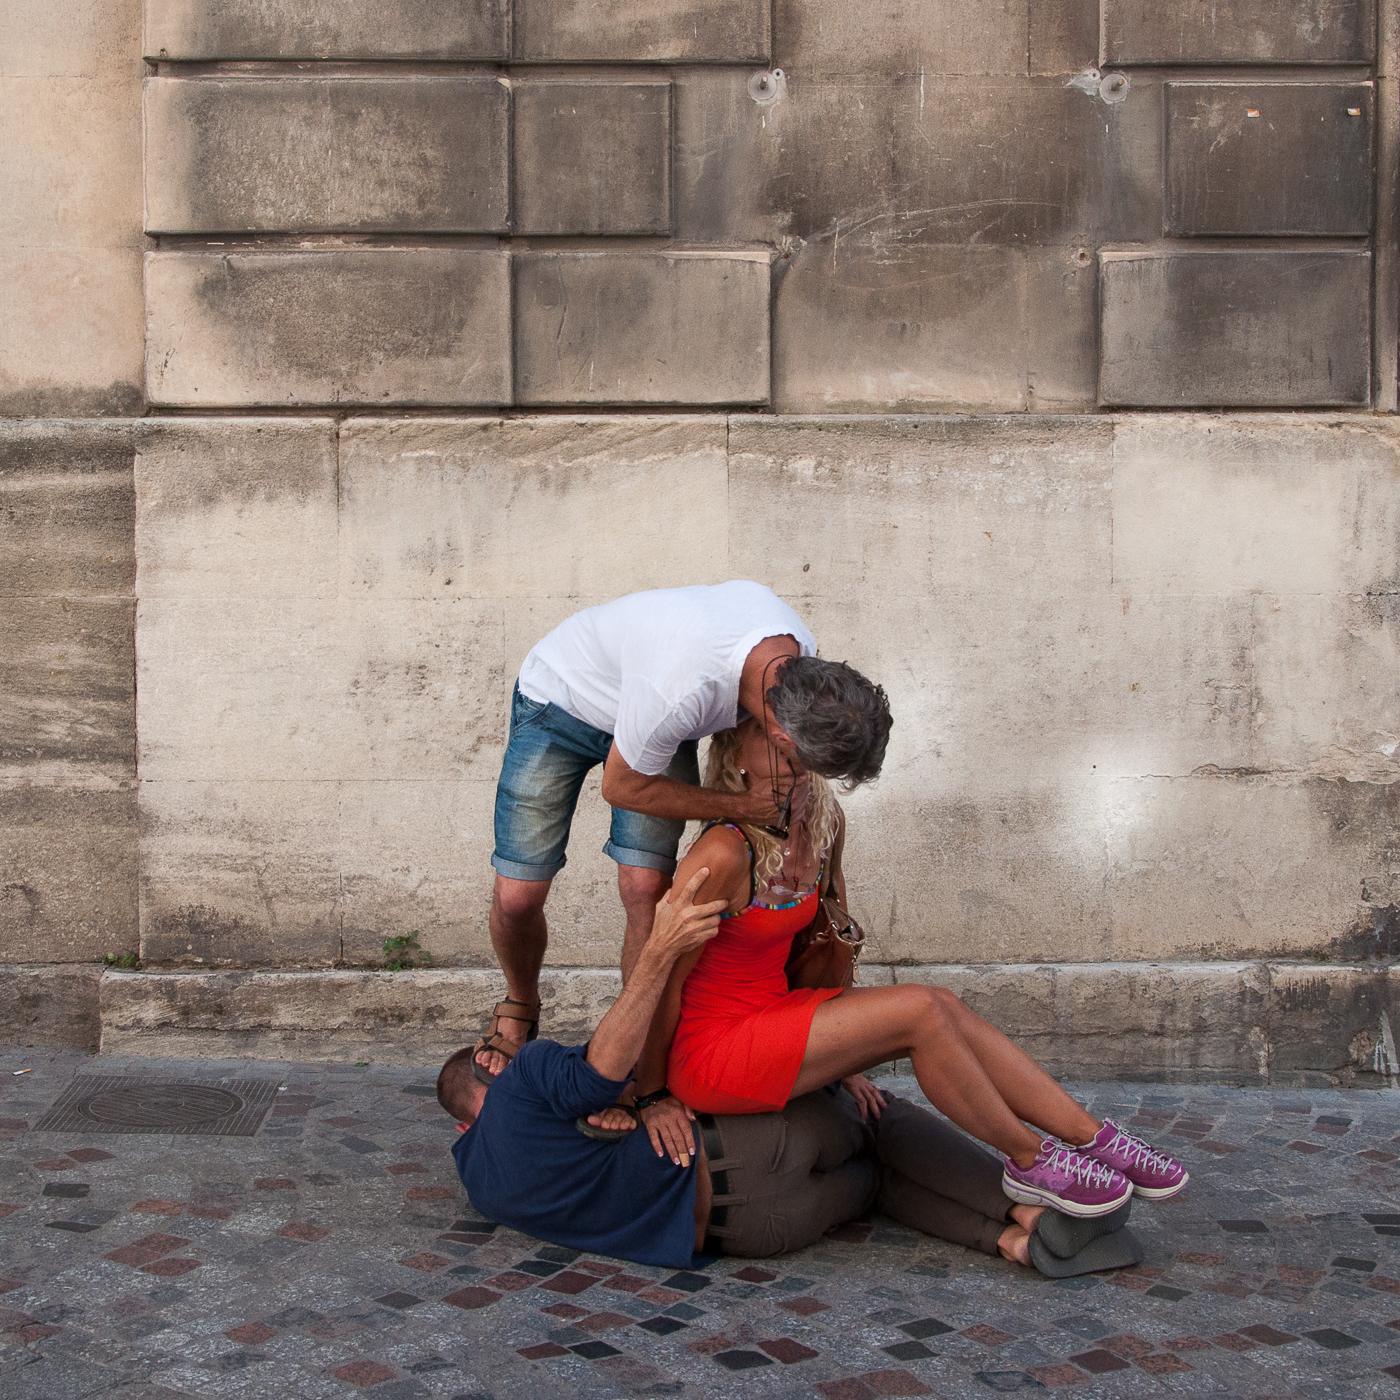 Arles 2015 - Baiser et tête écrasée